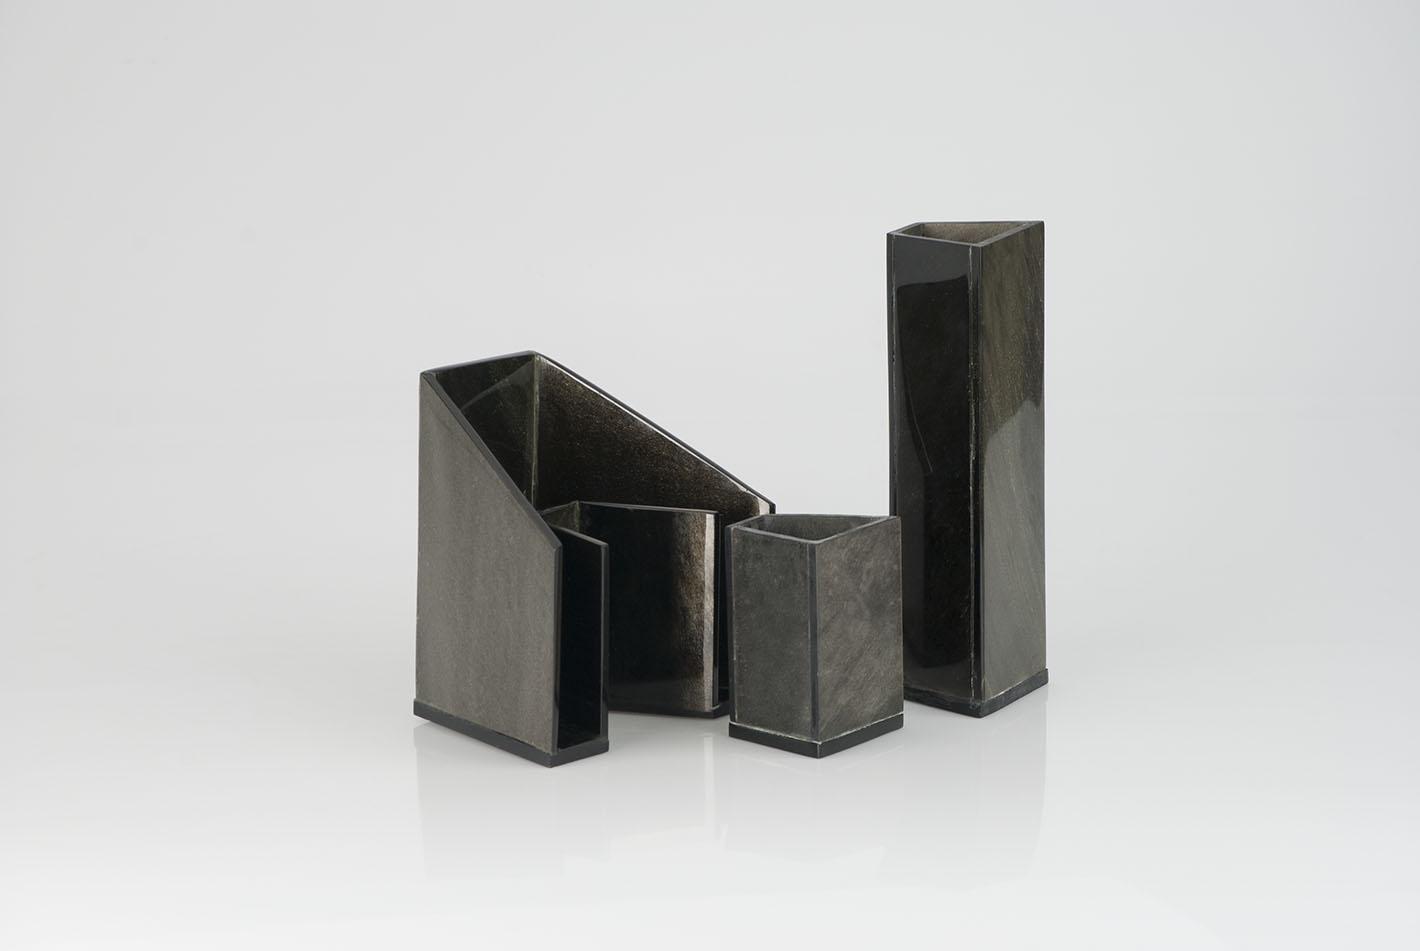 web2-Obsidian-Anahuac_DSC0186-acessory-desk-2-Mexico-Design-Time-Marion-Friedmann.jpg